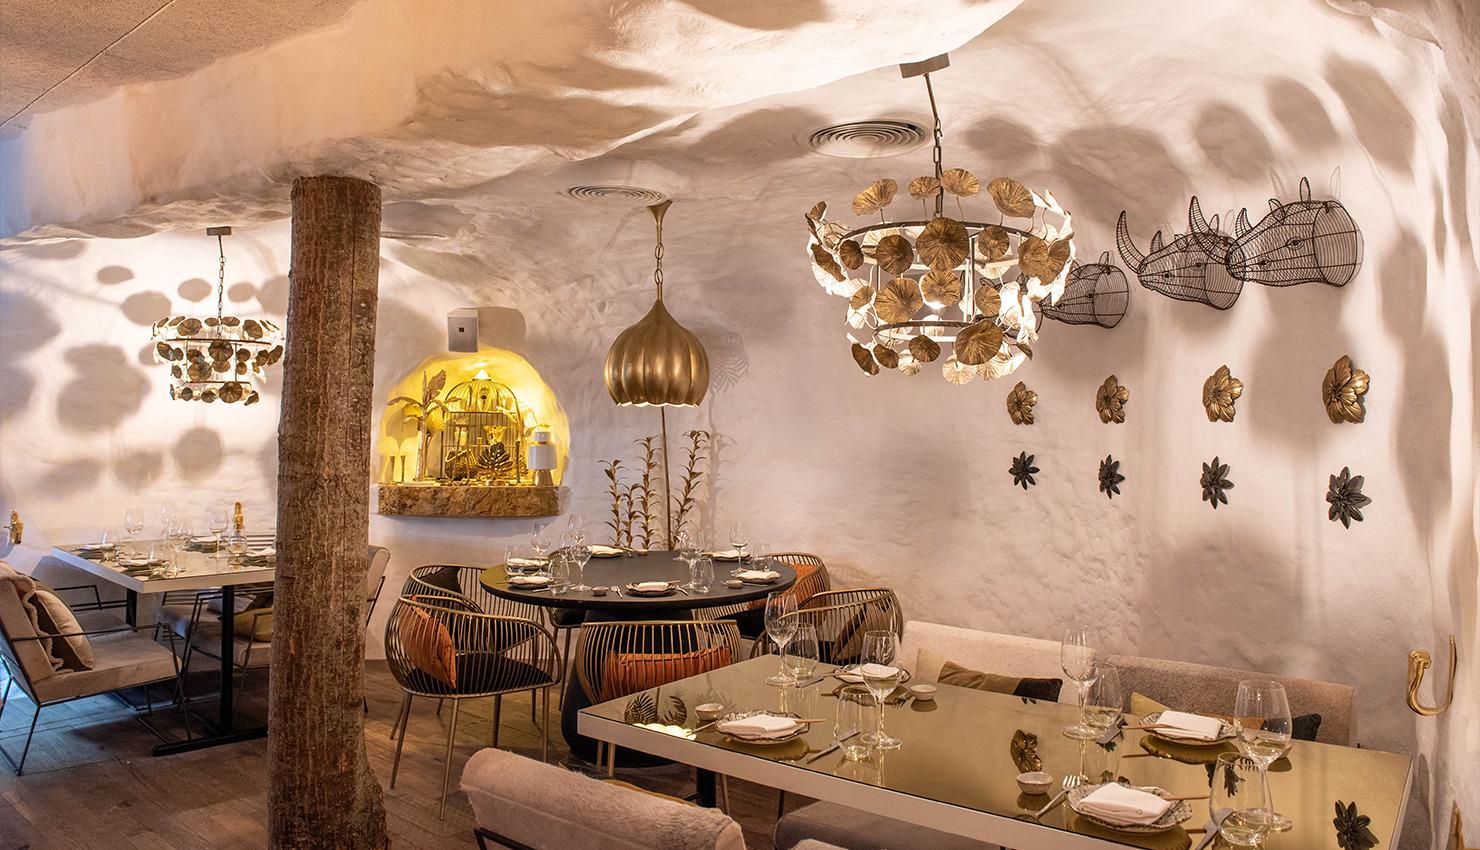 salvaje-restaurante-barcelona-gastronomía-magazinehorse